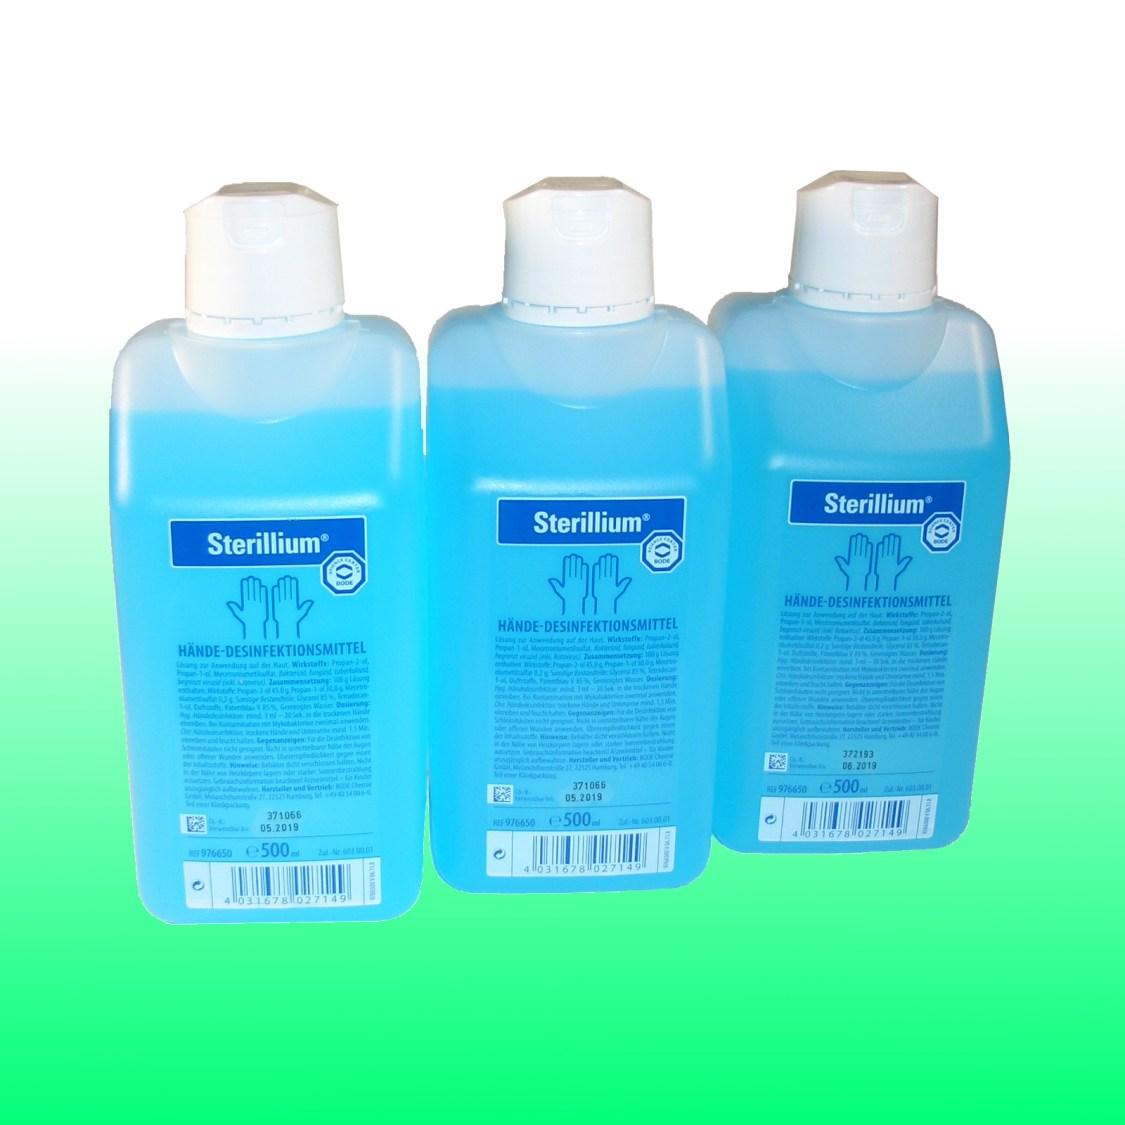 Sterillium® 3 x Händedesinfektion Bode Sterillium 500ml Sterilium